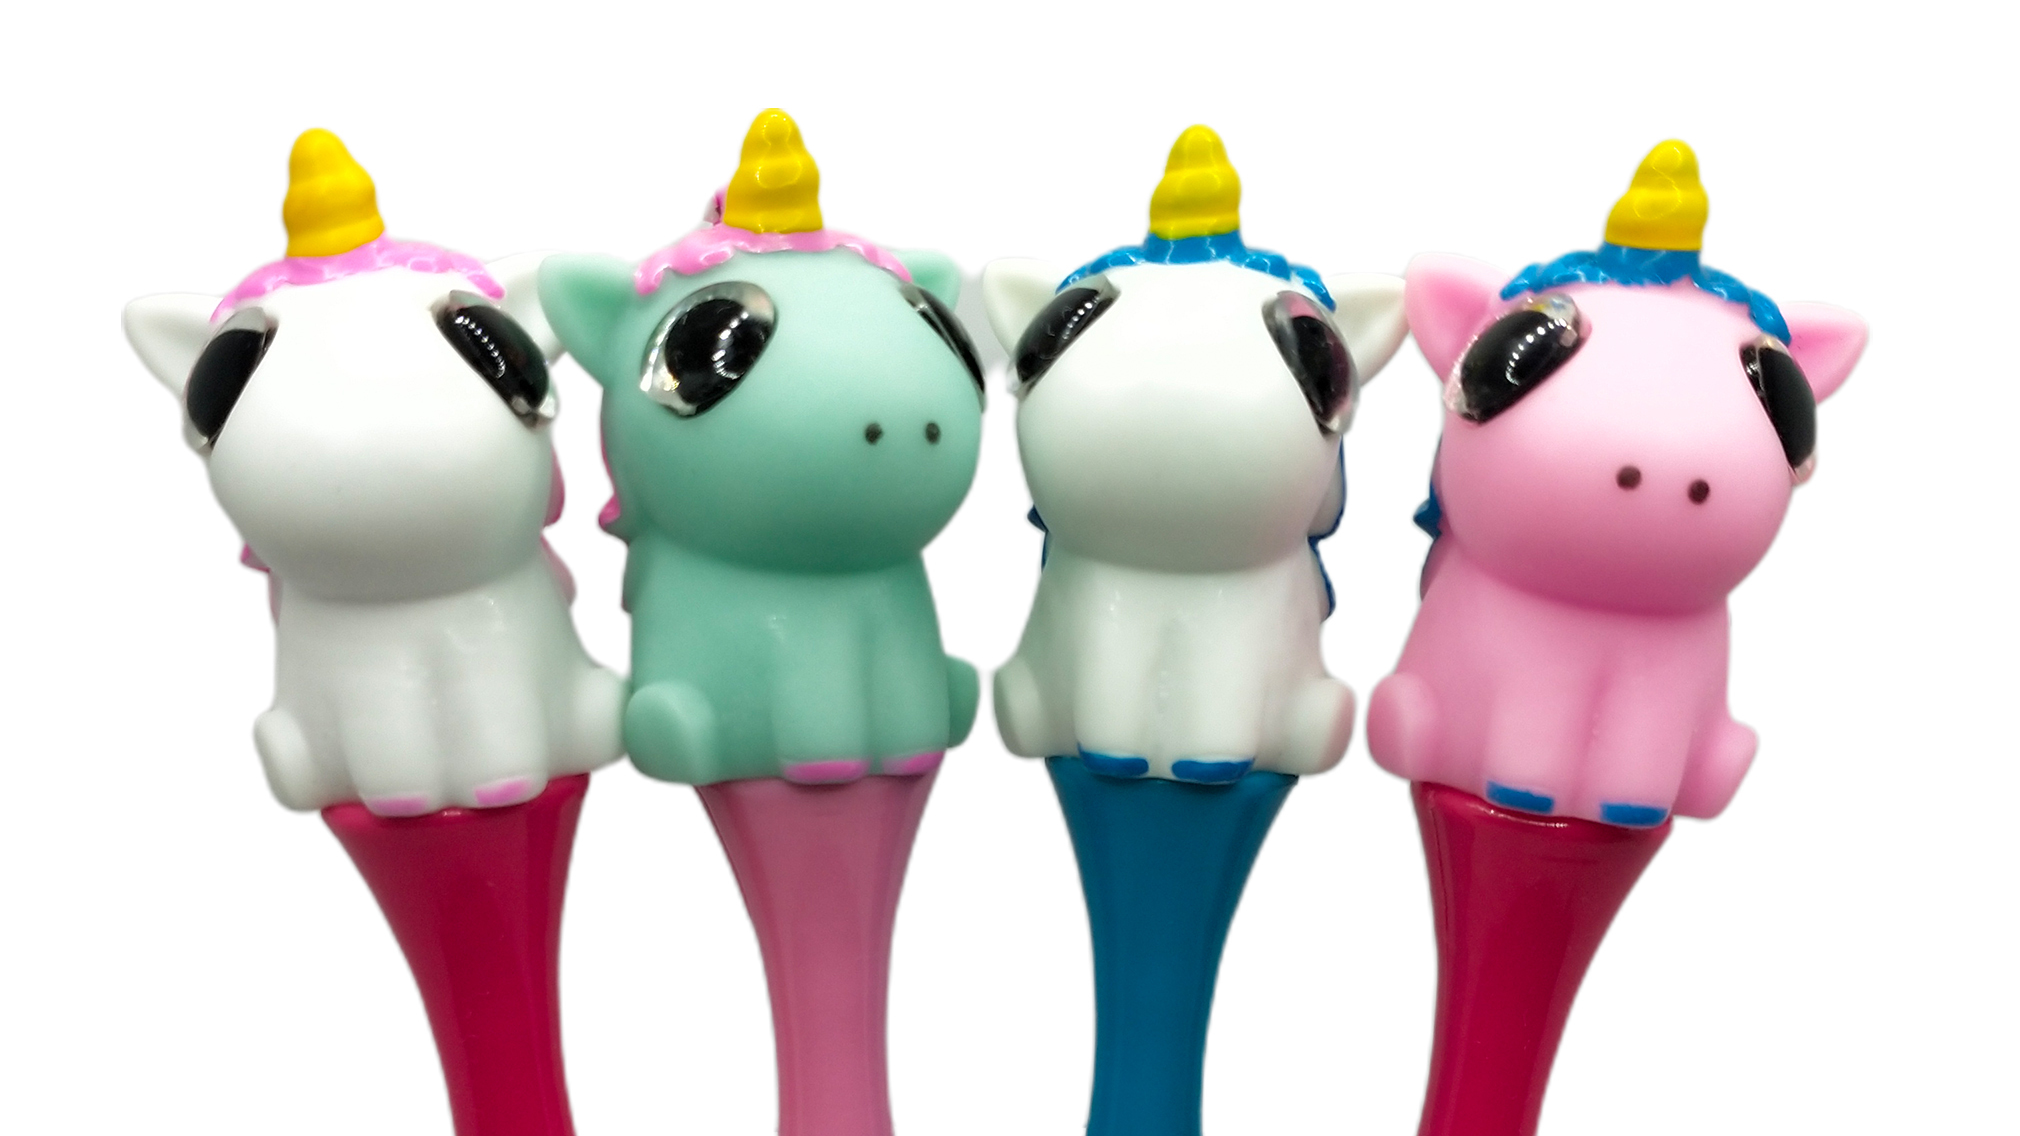 Customized Manufacturer directly sale plastic coloful unicorn pen with glitter eye